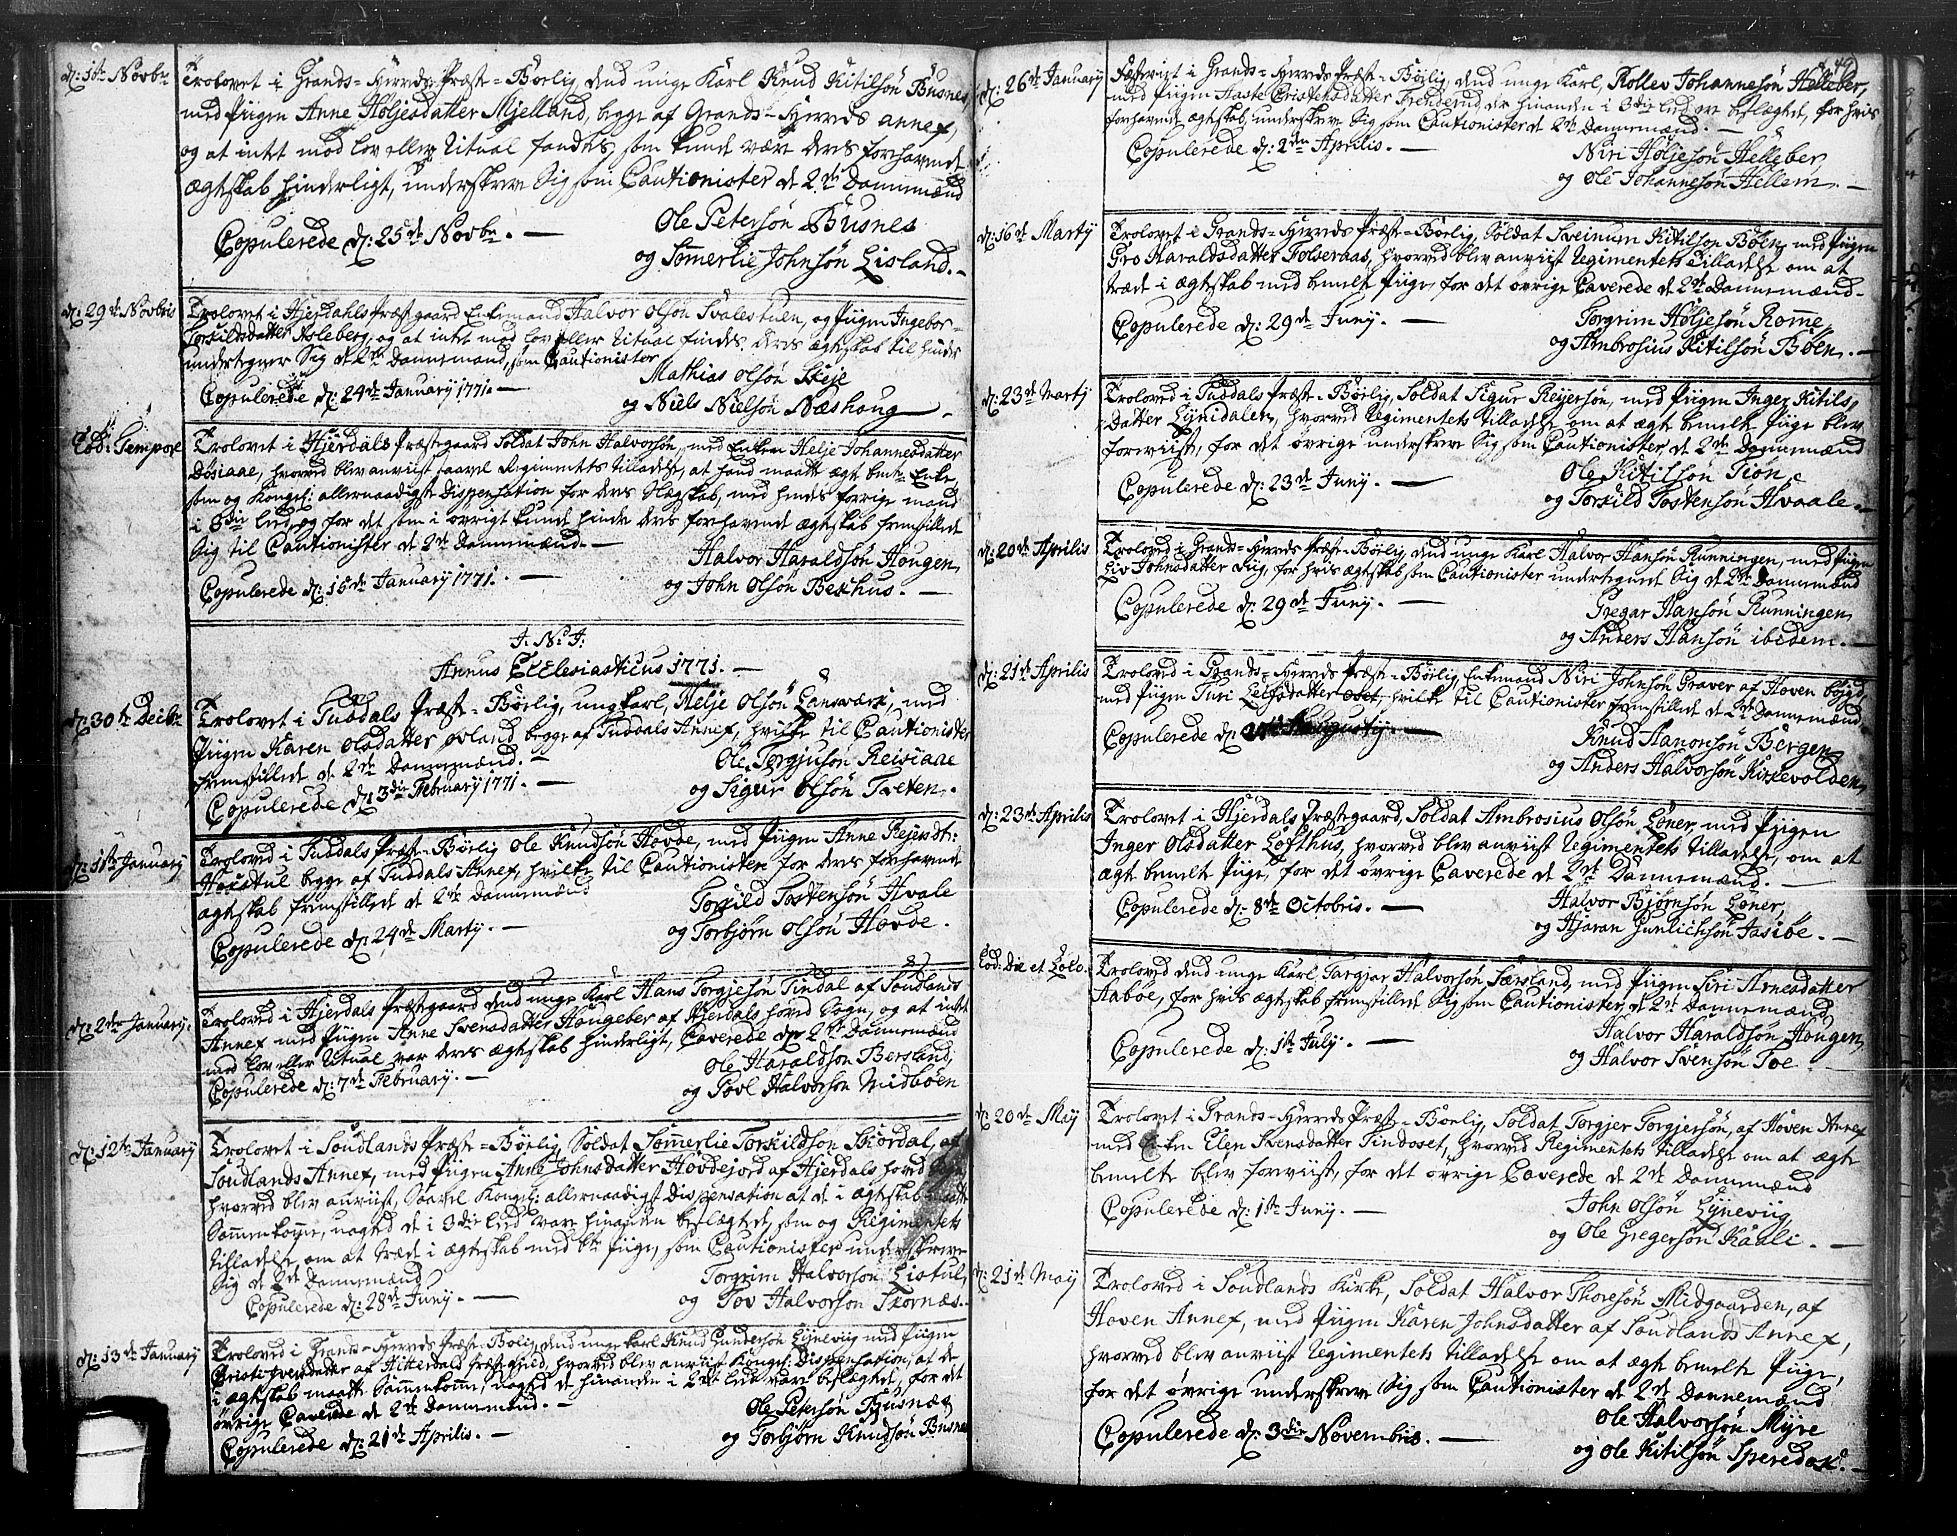 SAKO, Hjartdal kirkebøker, F/Fa/L0004: Ministerialbok nr. I 4, 1727-1795, s. 49